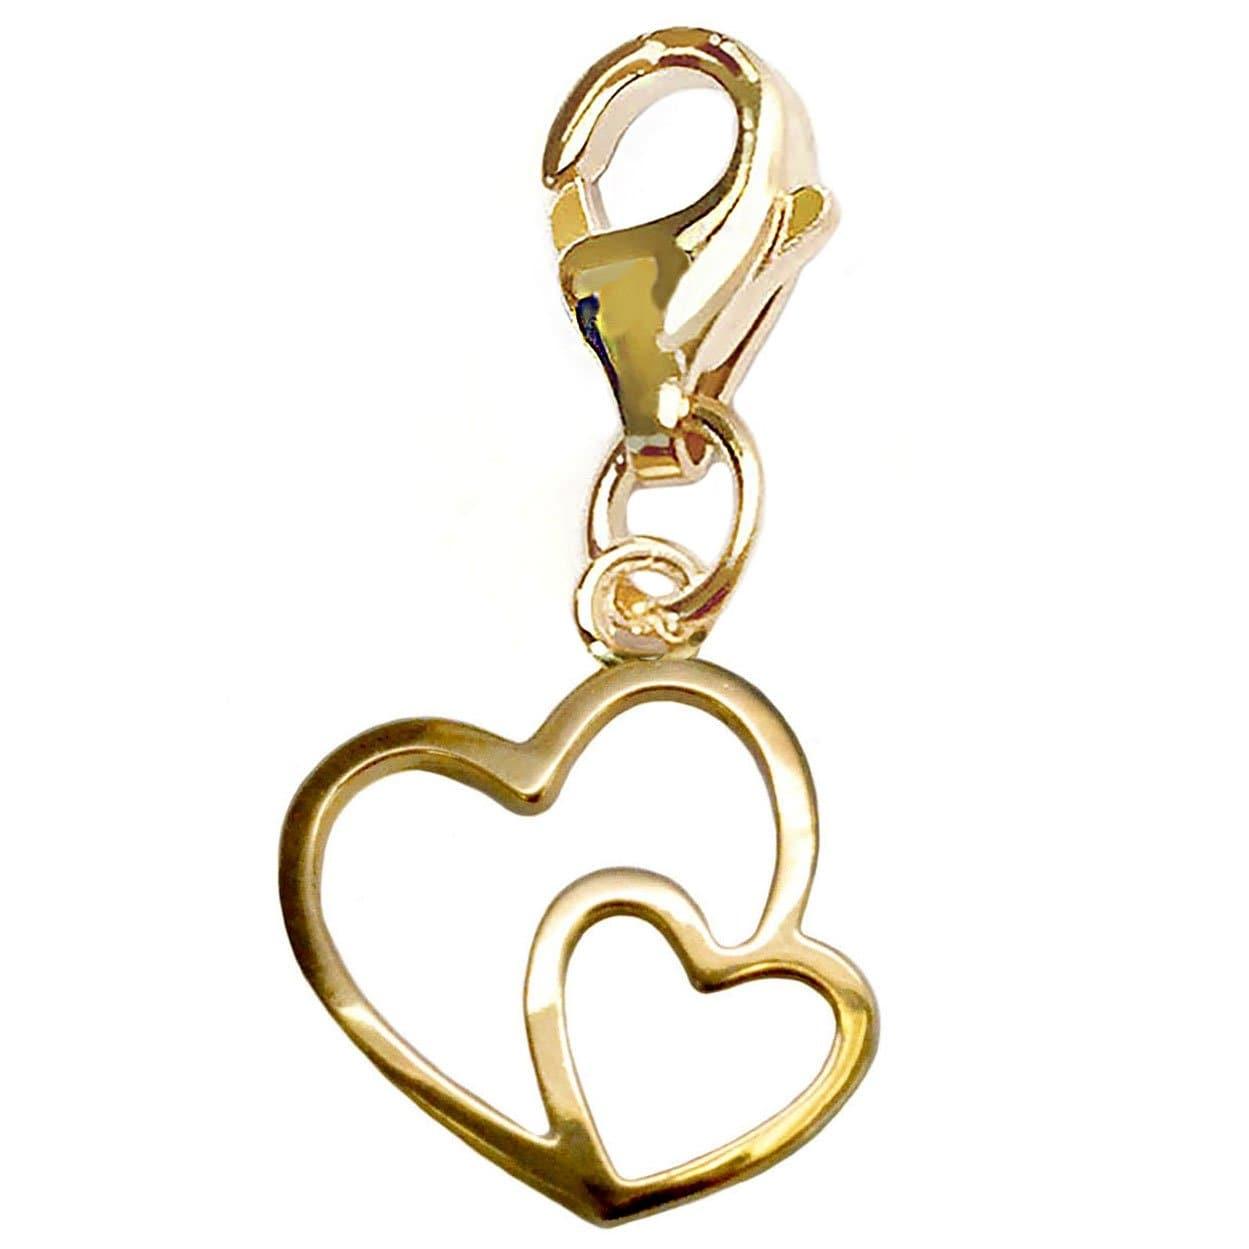 Julieta Jewelry Double Heart Gold Sterling Silver Charm - Thumbnail 0